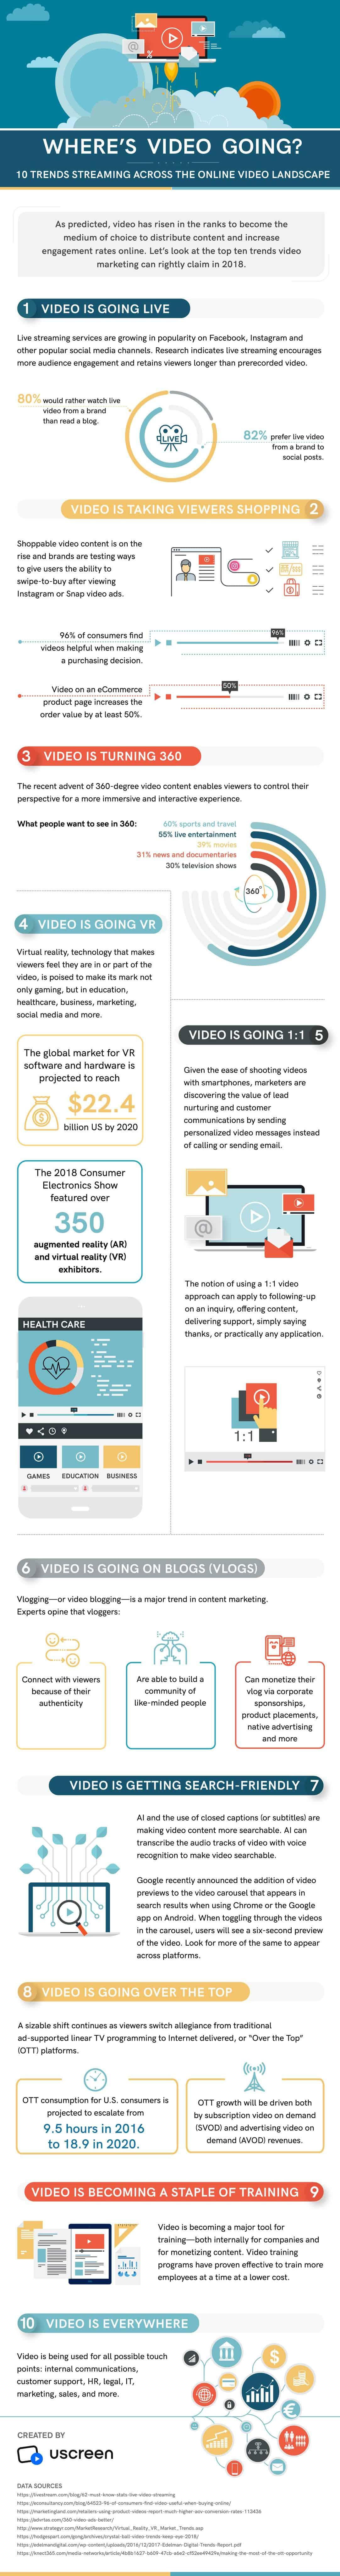 video marketing infographic Leapforce